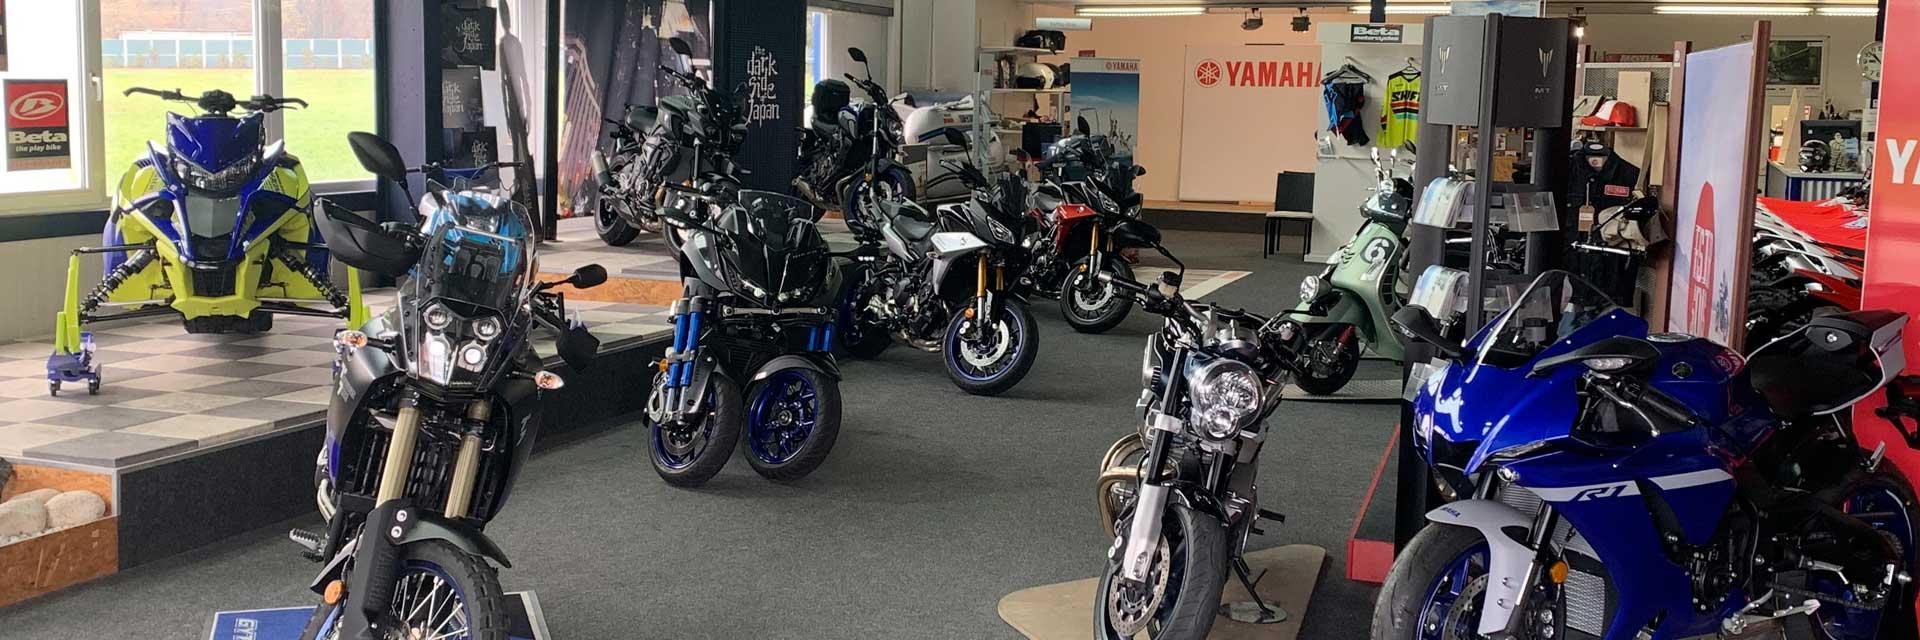 Motorrad Ressler Memmingerberg - Yamaha